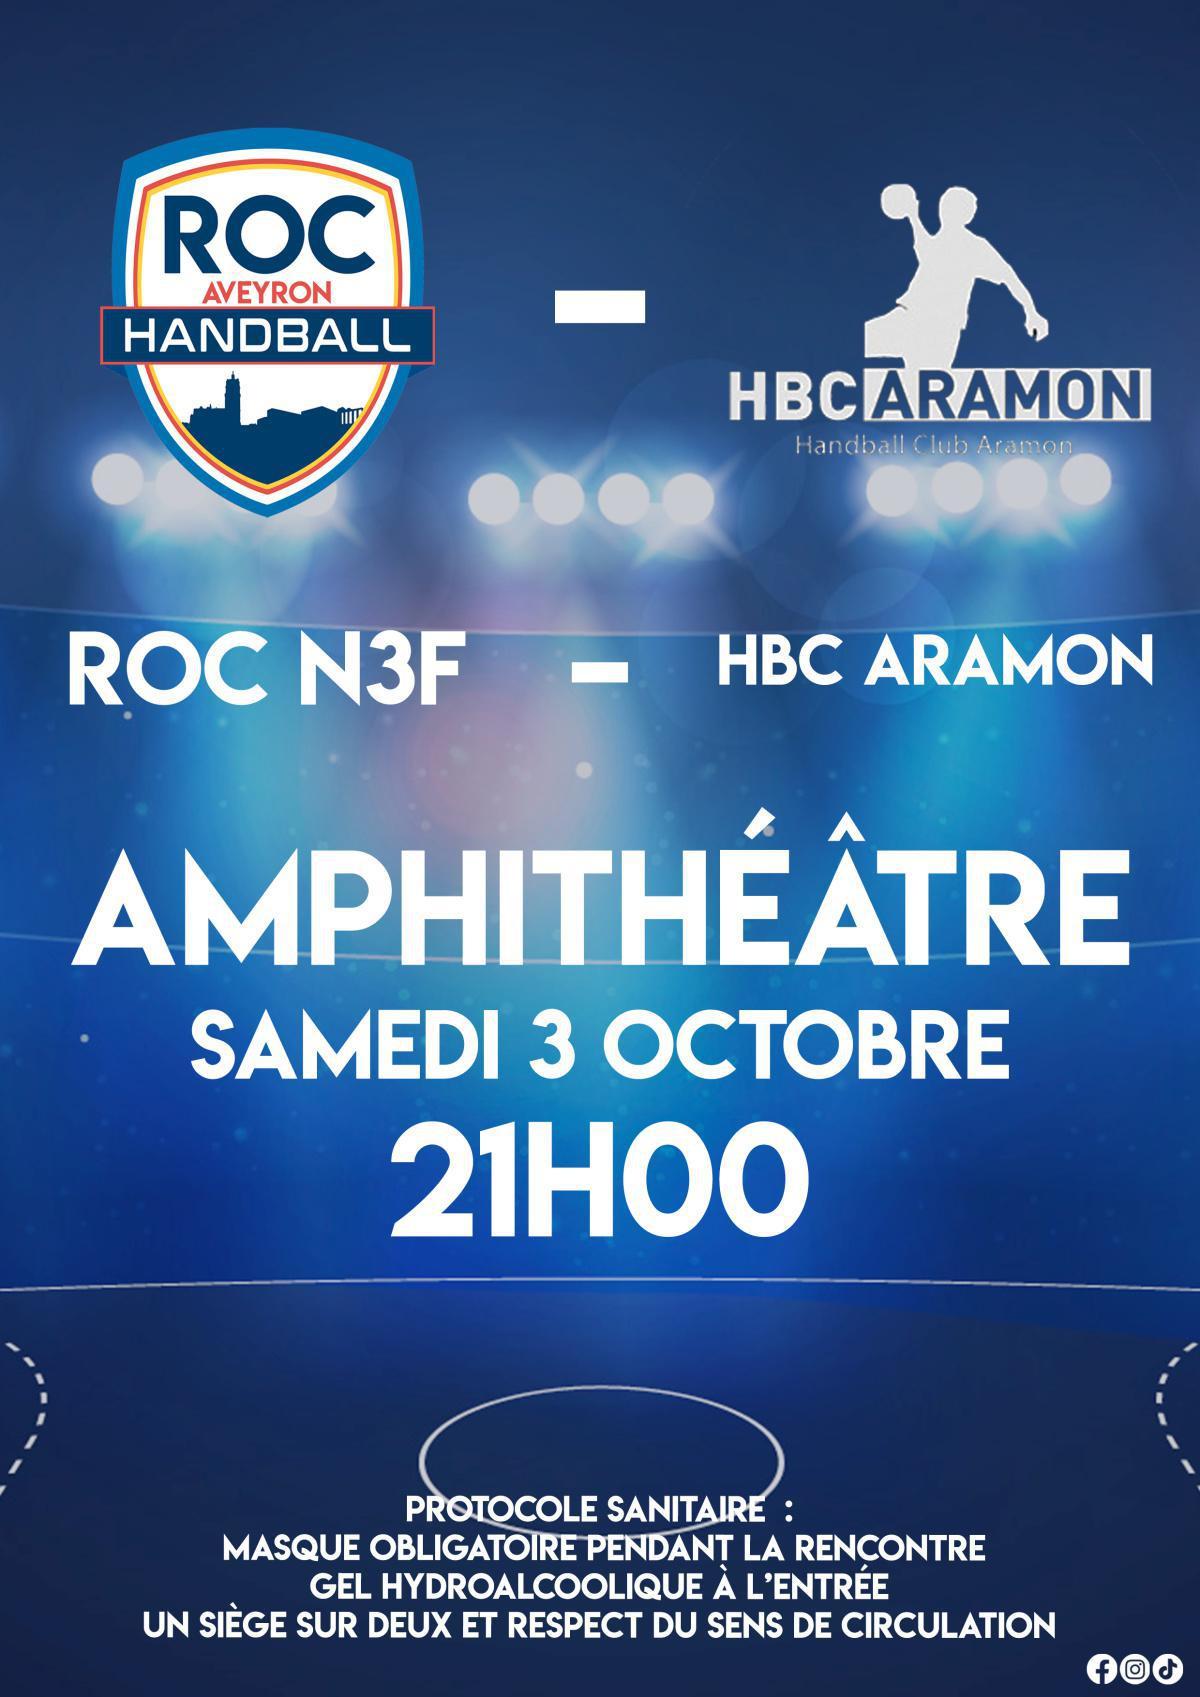 ROC N3F / HBC ARAMON